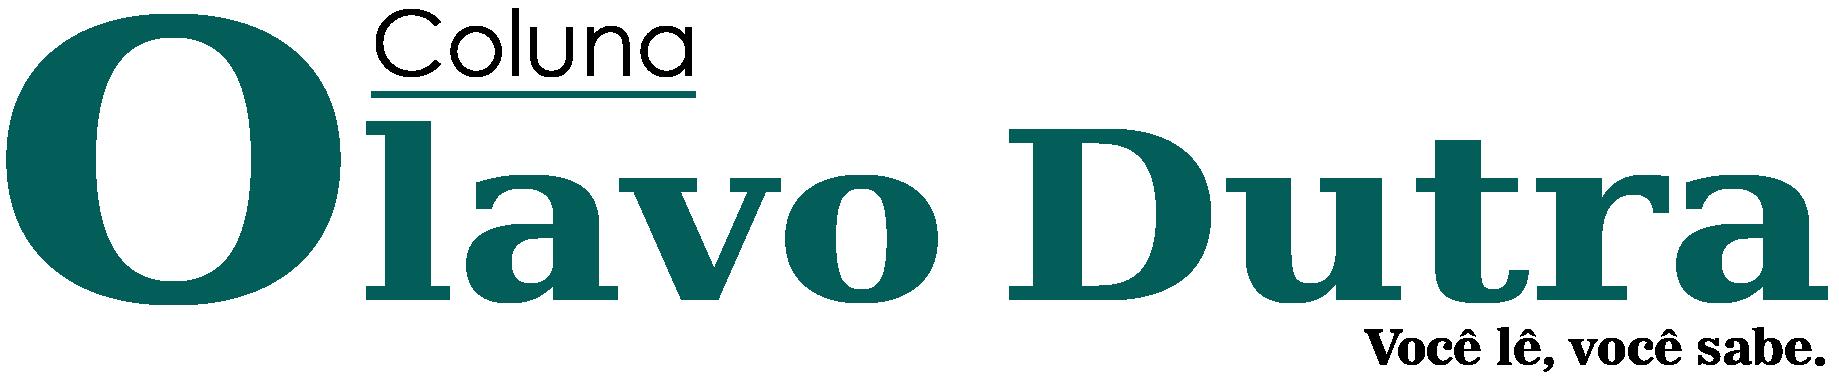 Coluna Olavo Dutra